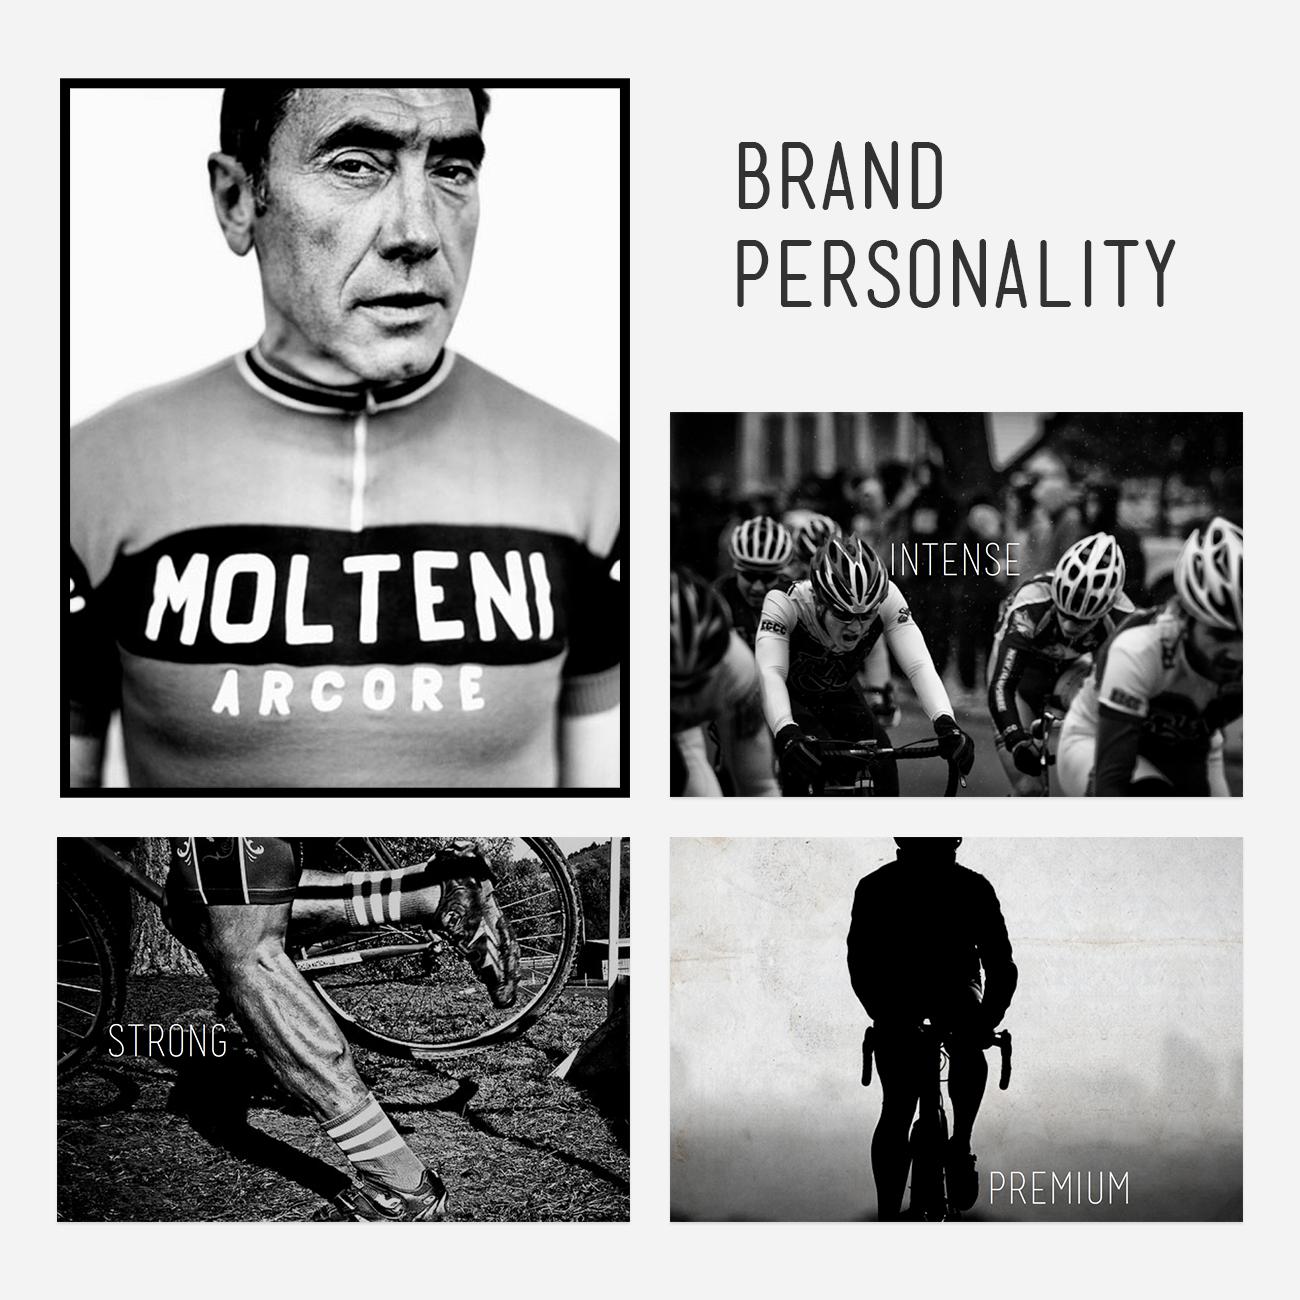 Bike7 - Brand Personality